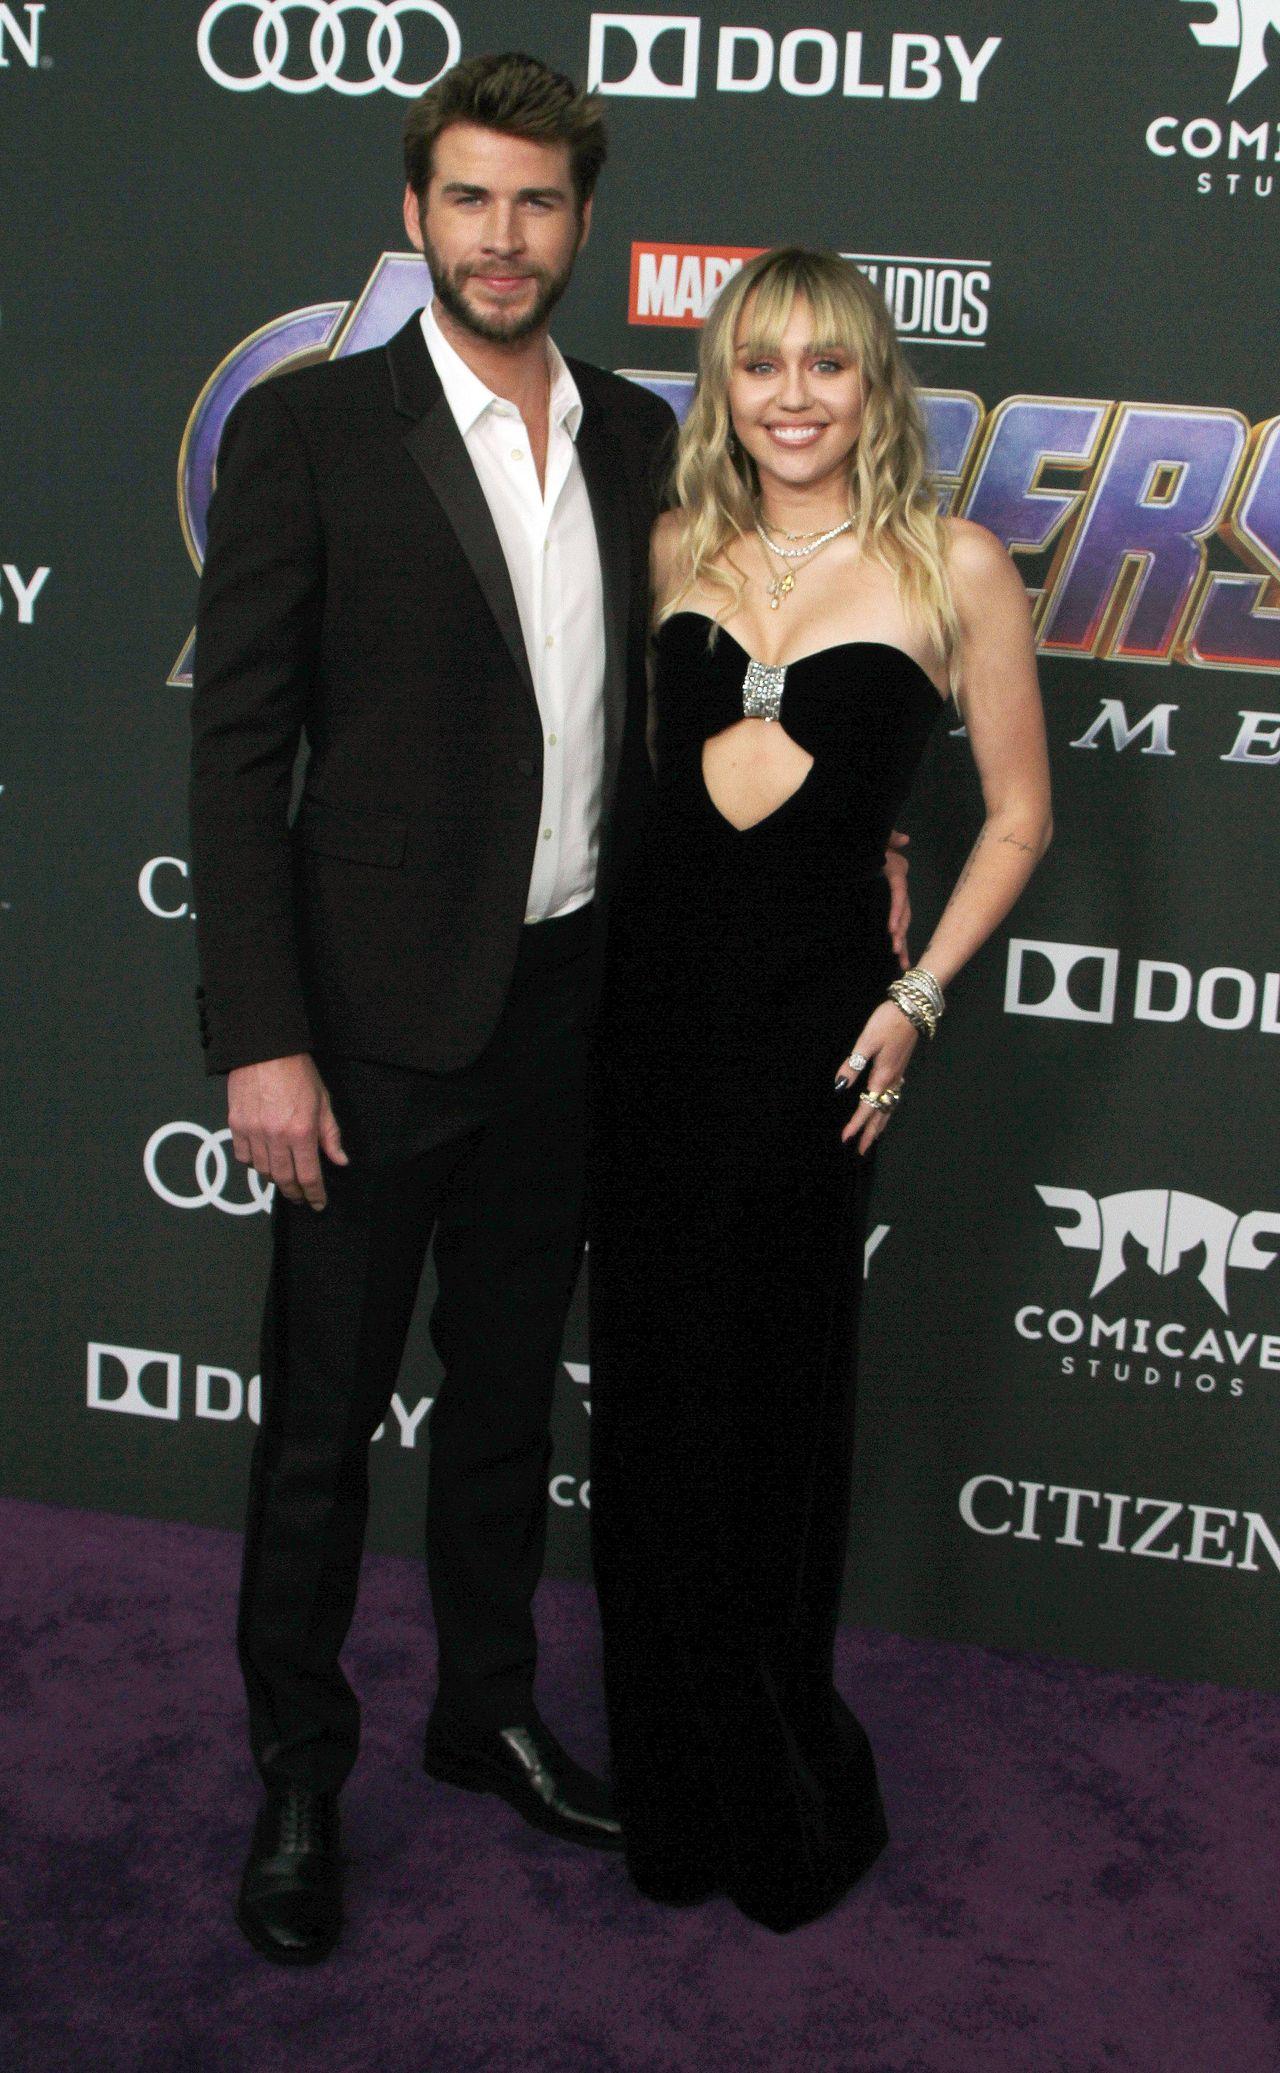 Miley Cyrus i Liam Hemsworth na premierze Avengers Endgame